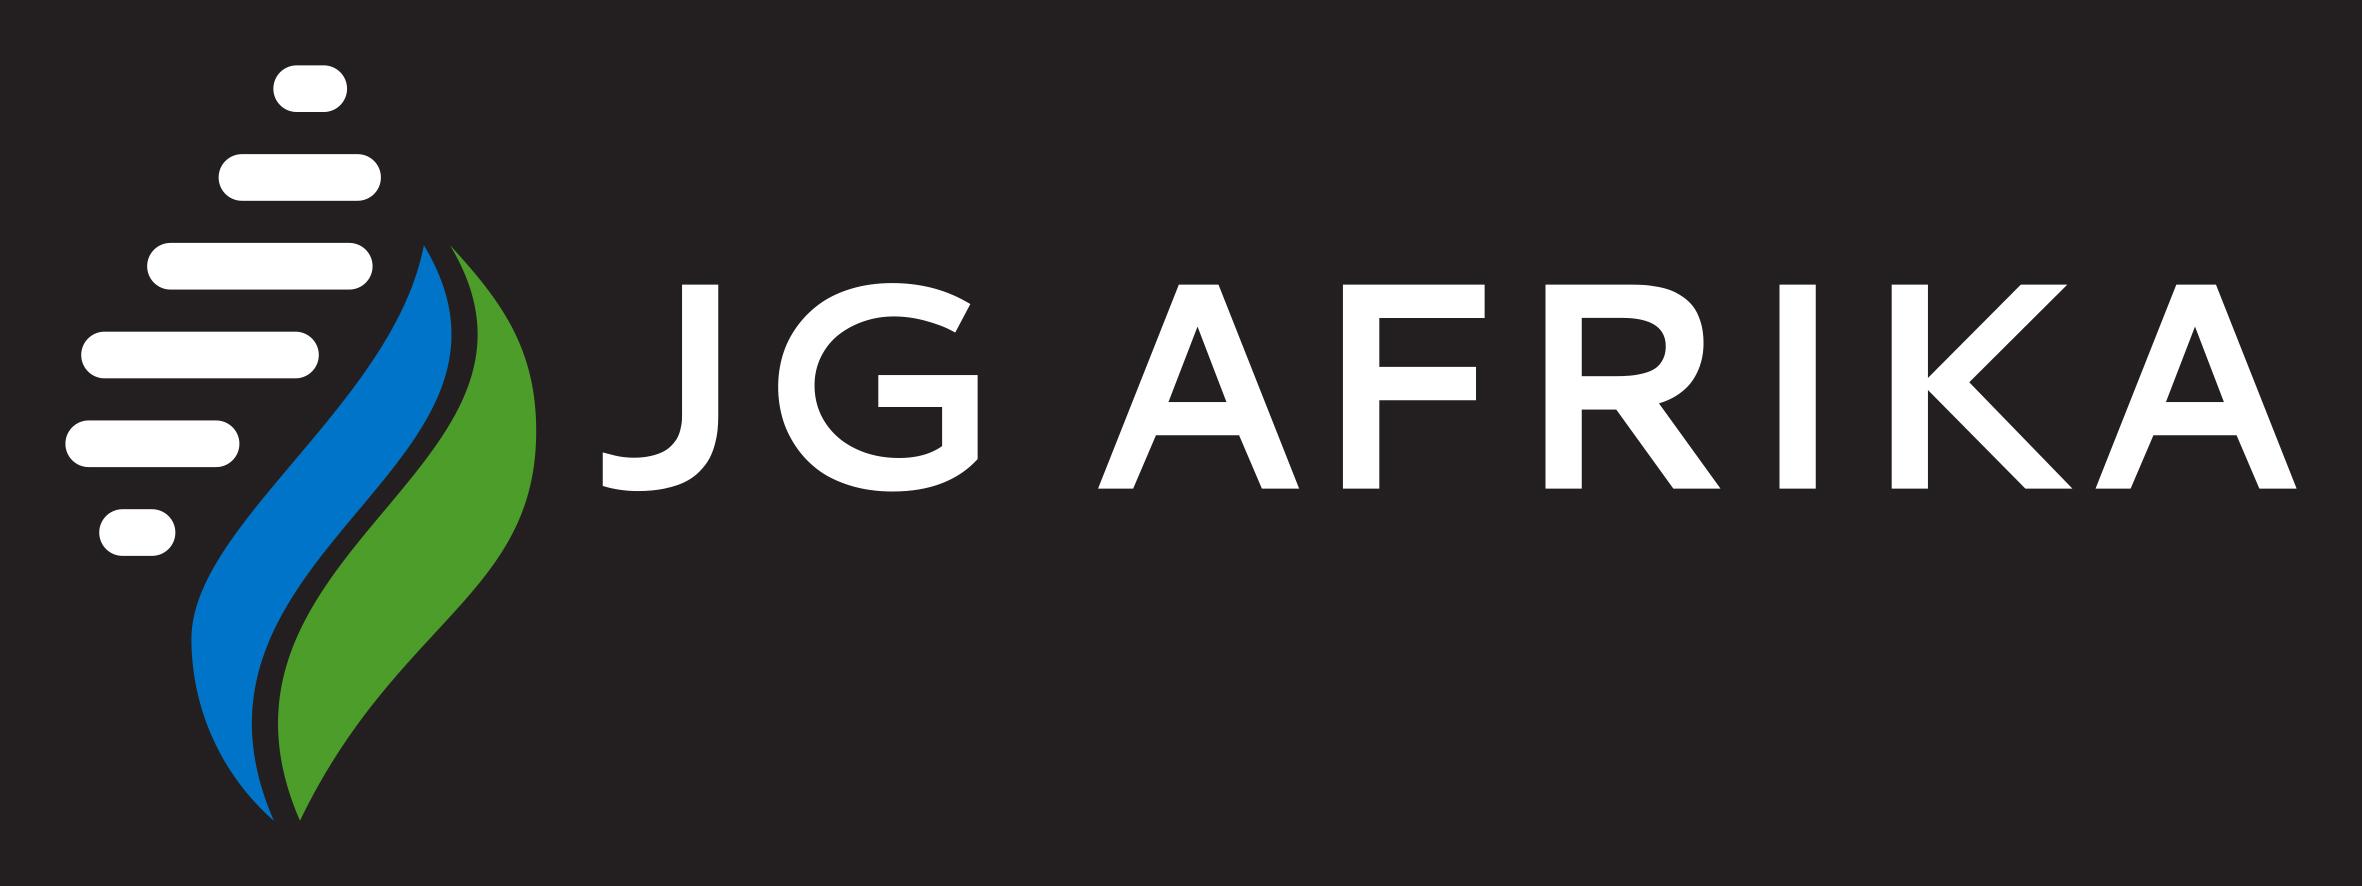 JG Afrika logo